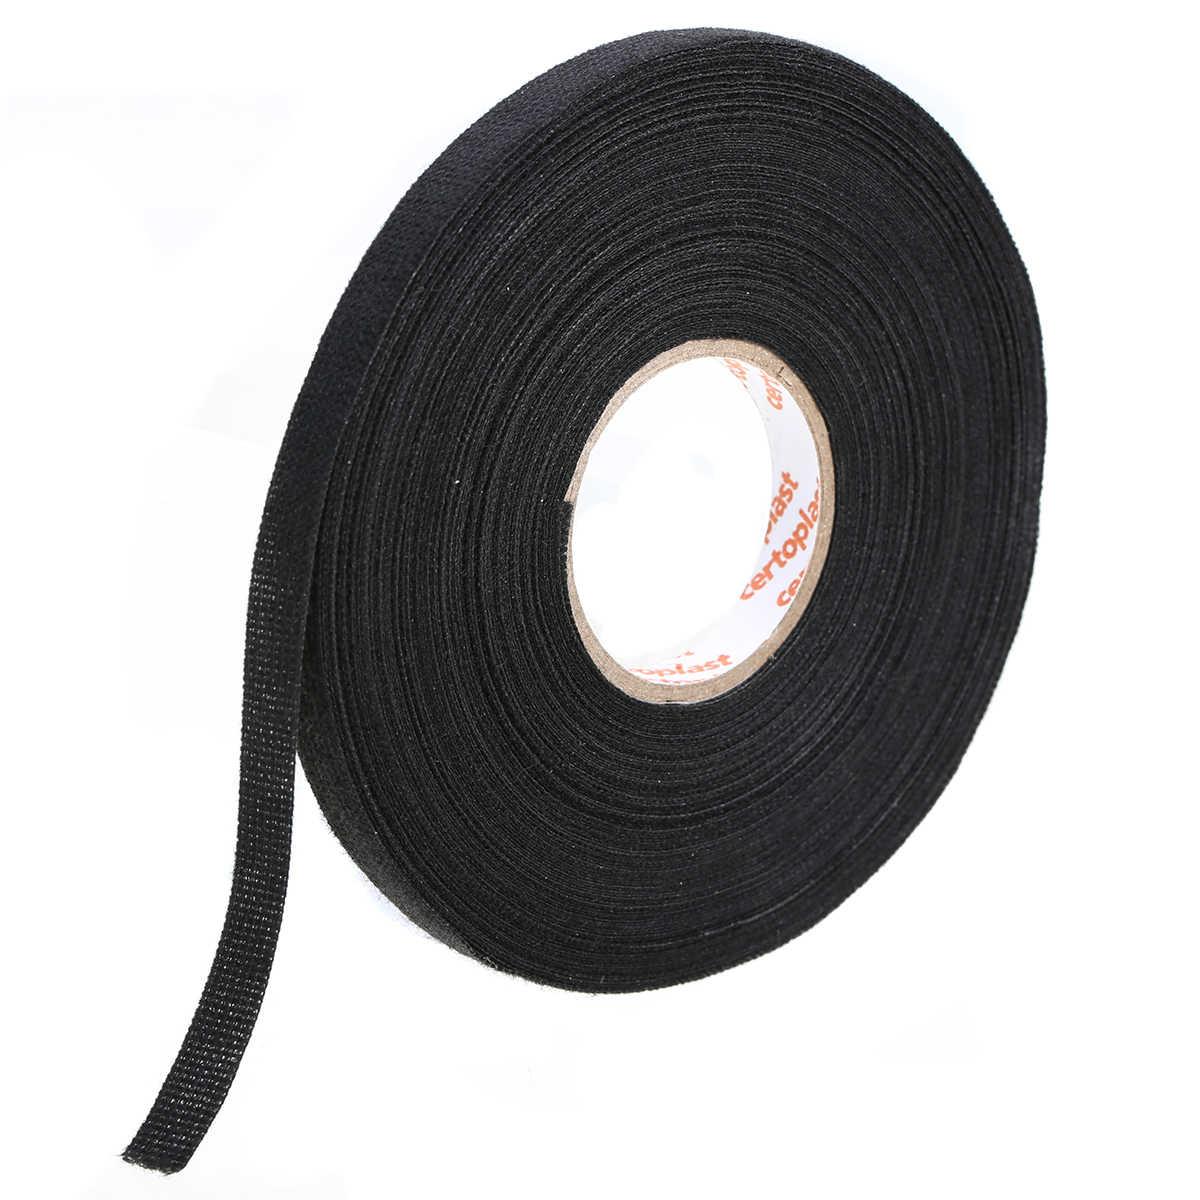 medium resolution of  1pc black anti wear adhesive cloth fabric tape looms wiring harness tape 25m x 9mm